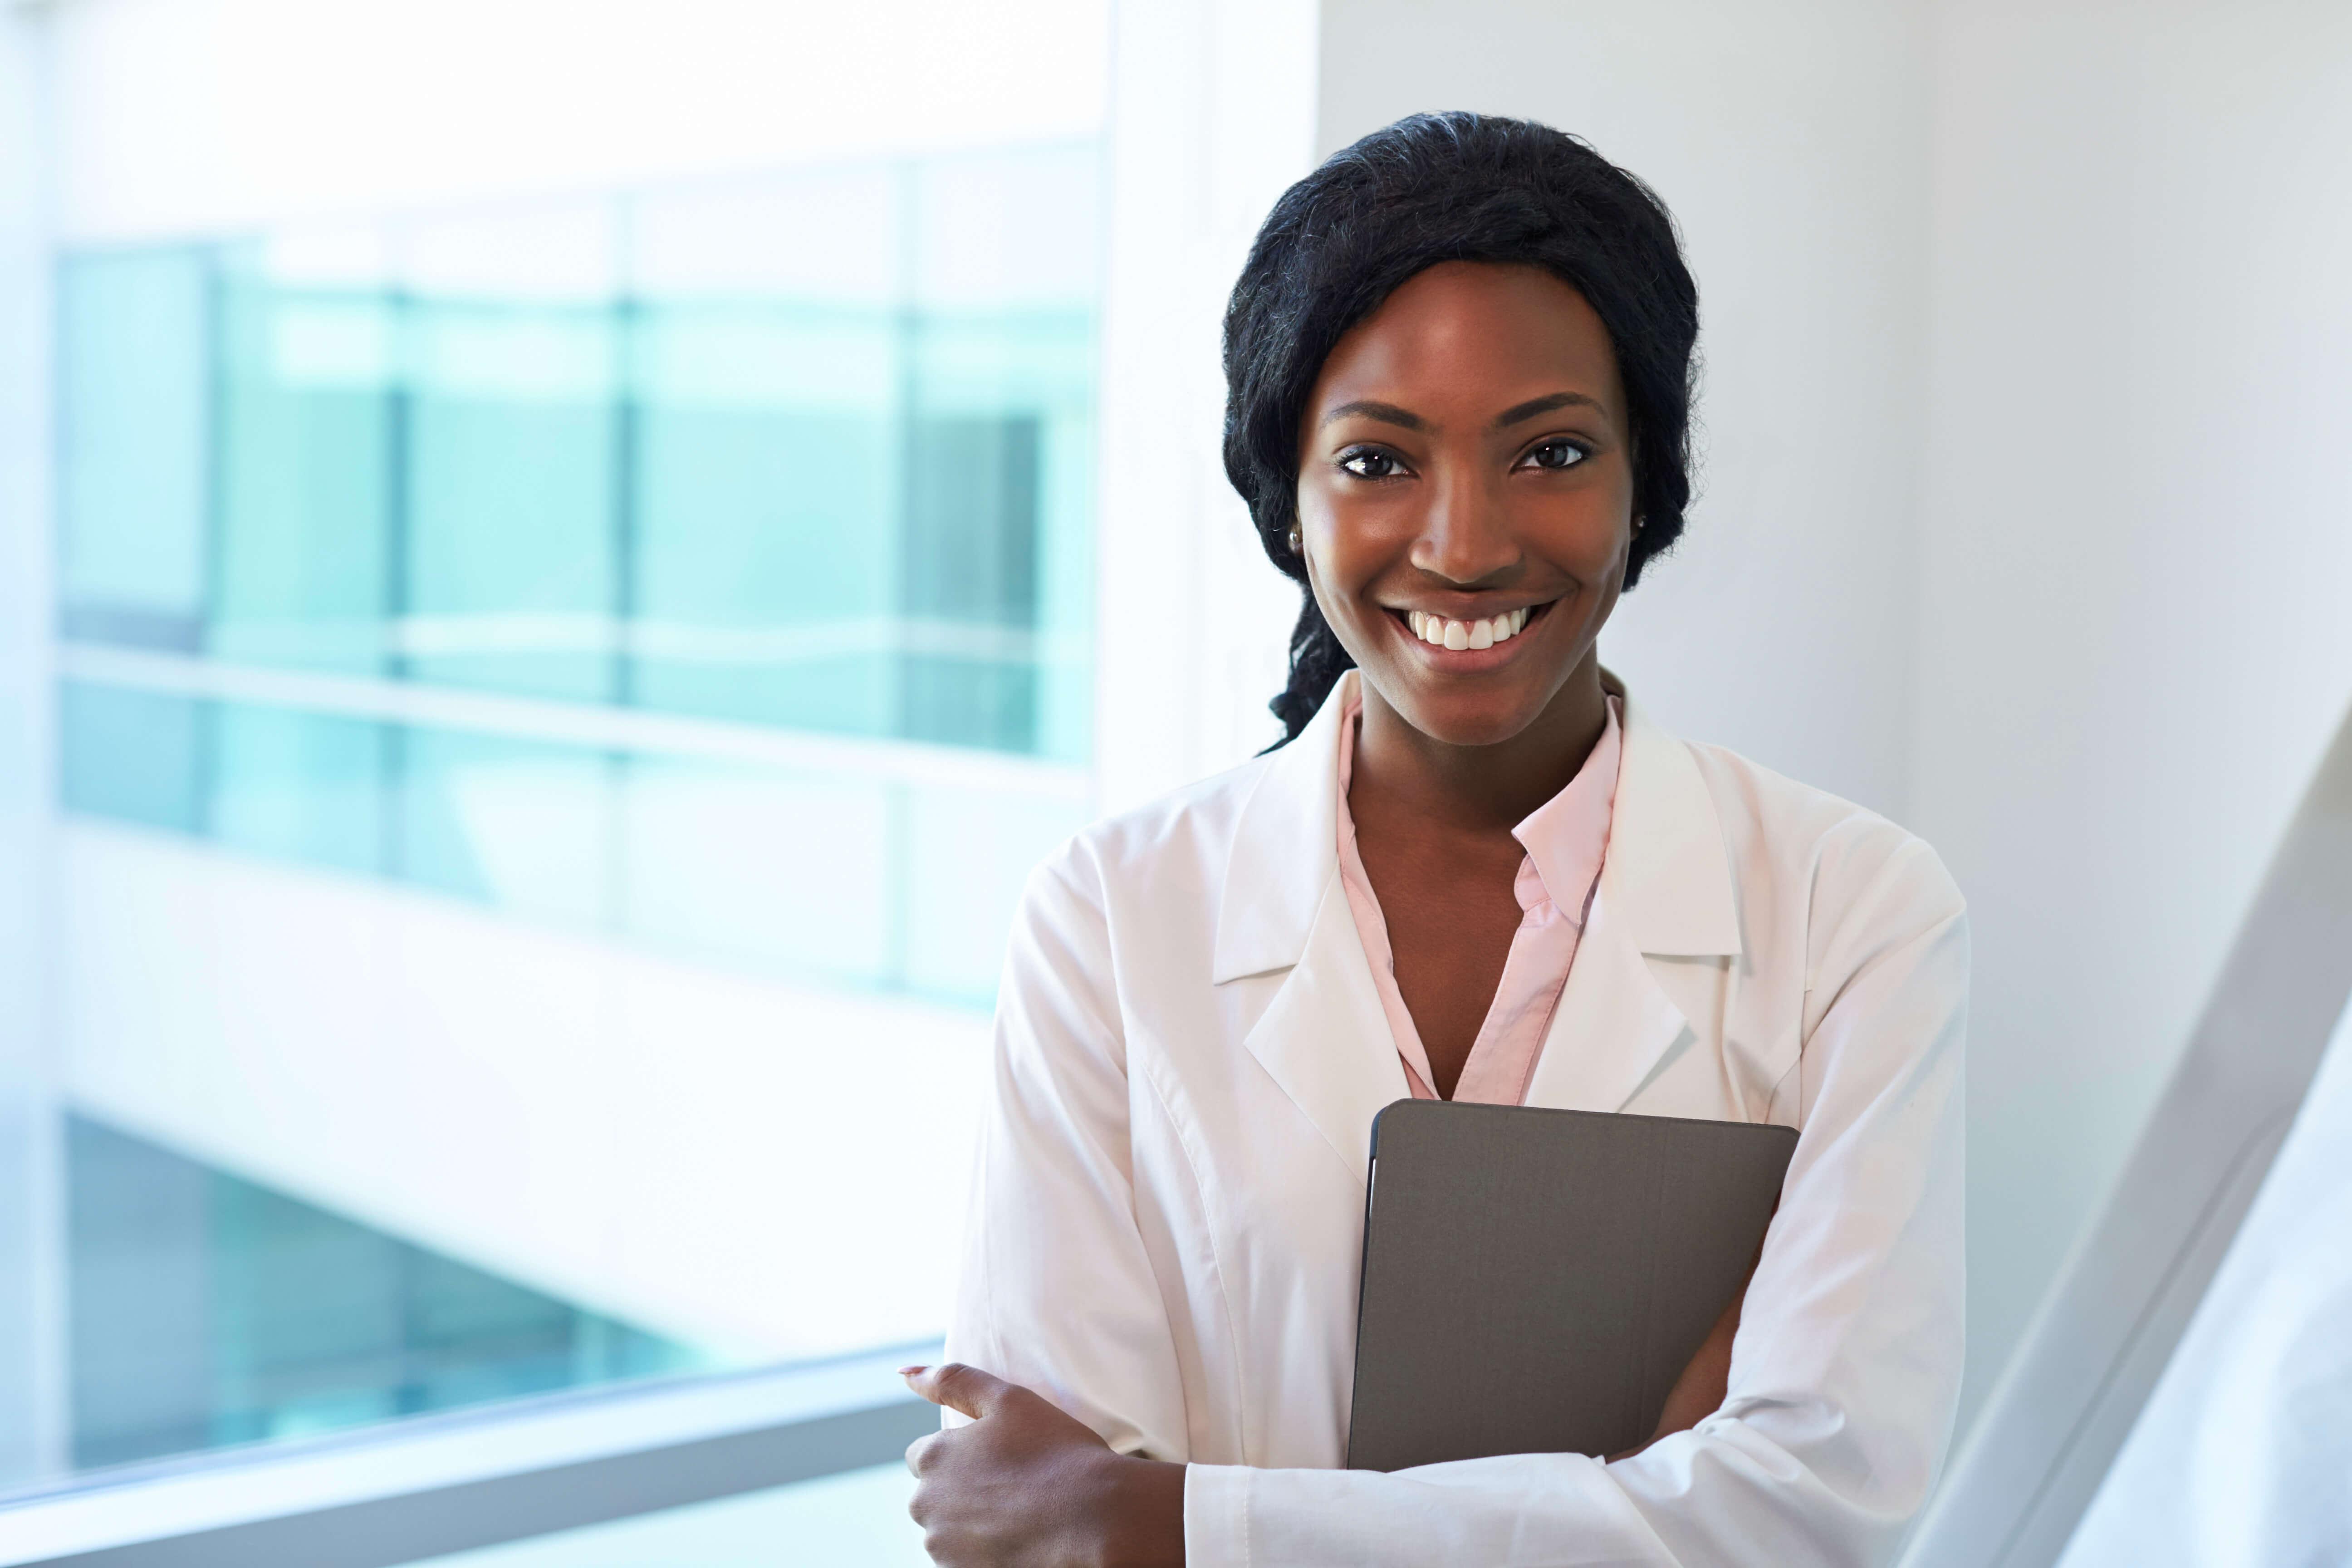 african american nurse smile telephonic triage advice hospital healthcare